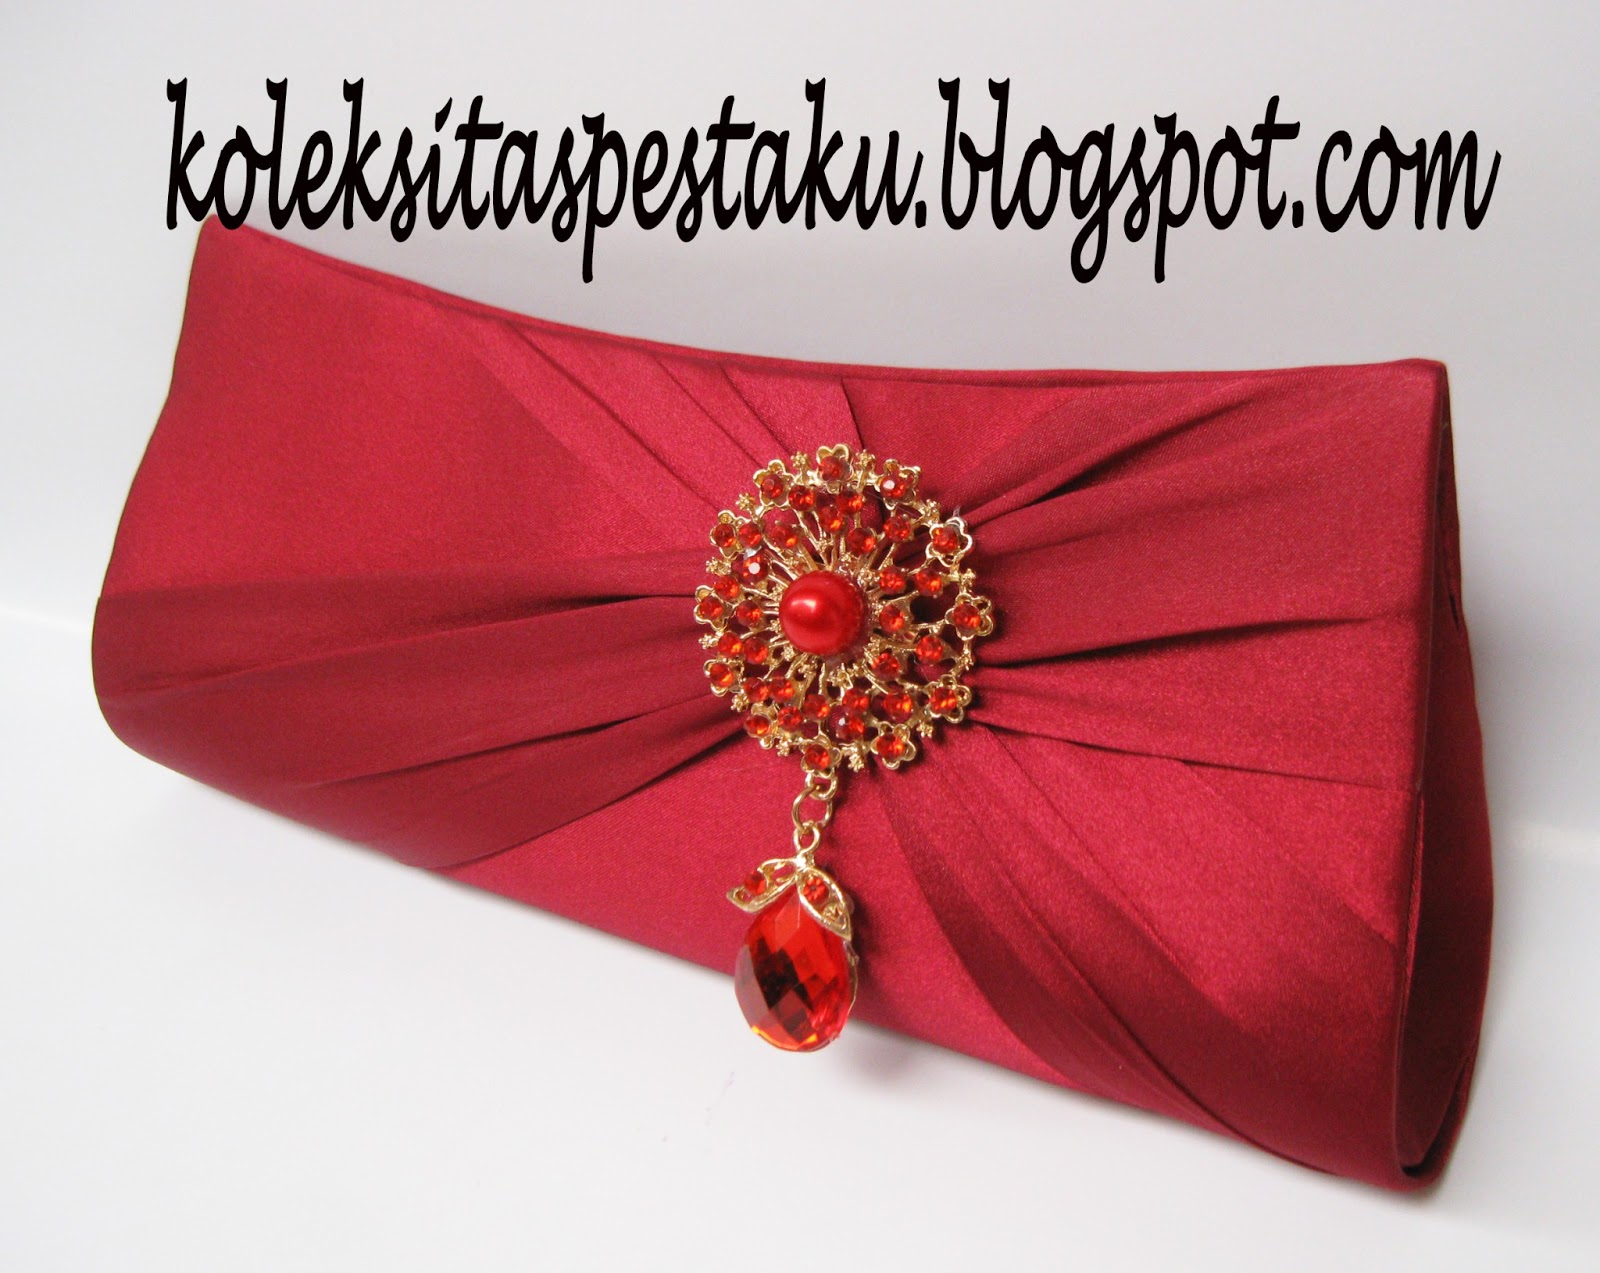 Tas Pesta - Clutch Bag  taspestaku  Tas Pesta Maroon Cantik dengan ... dff15fe6c8